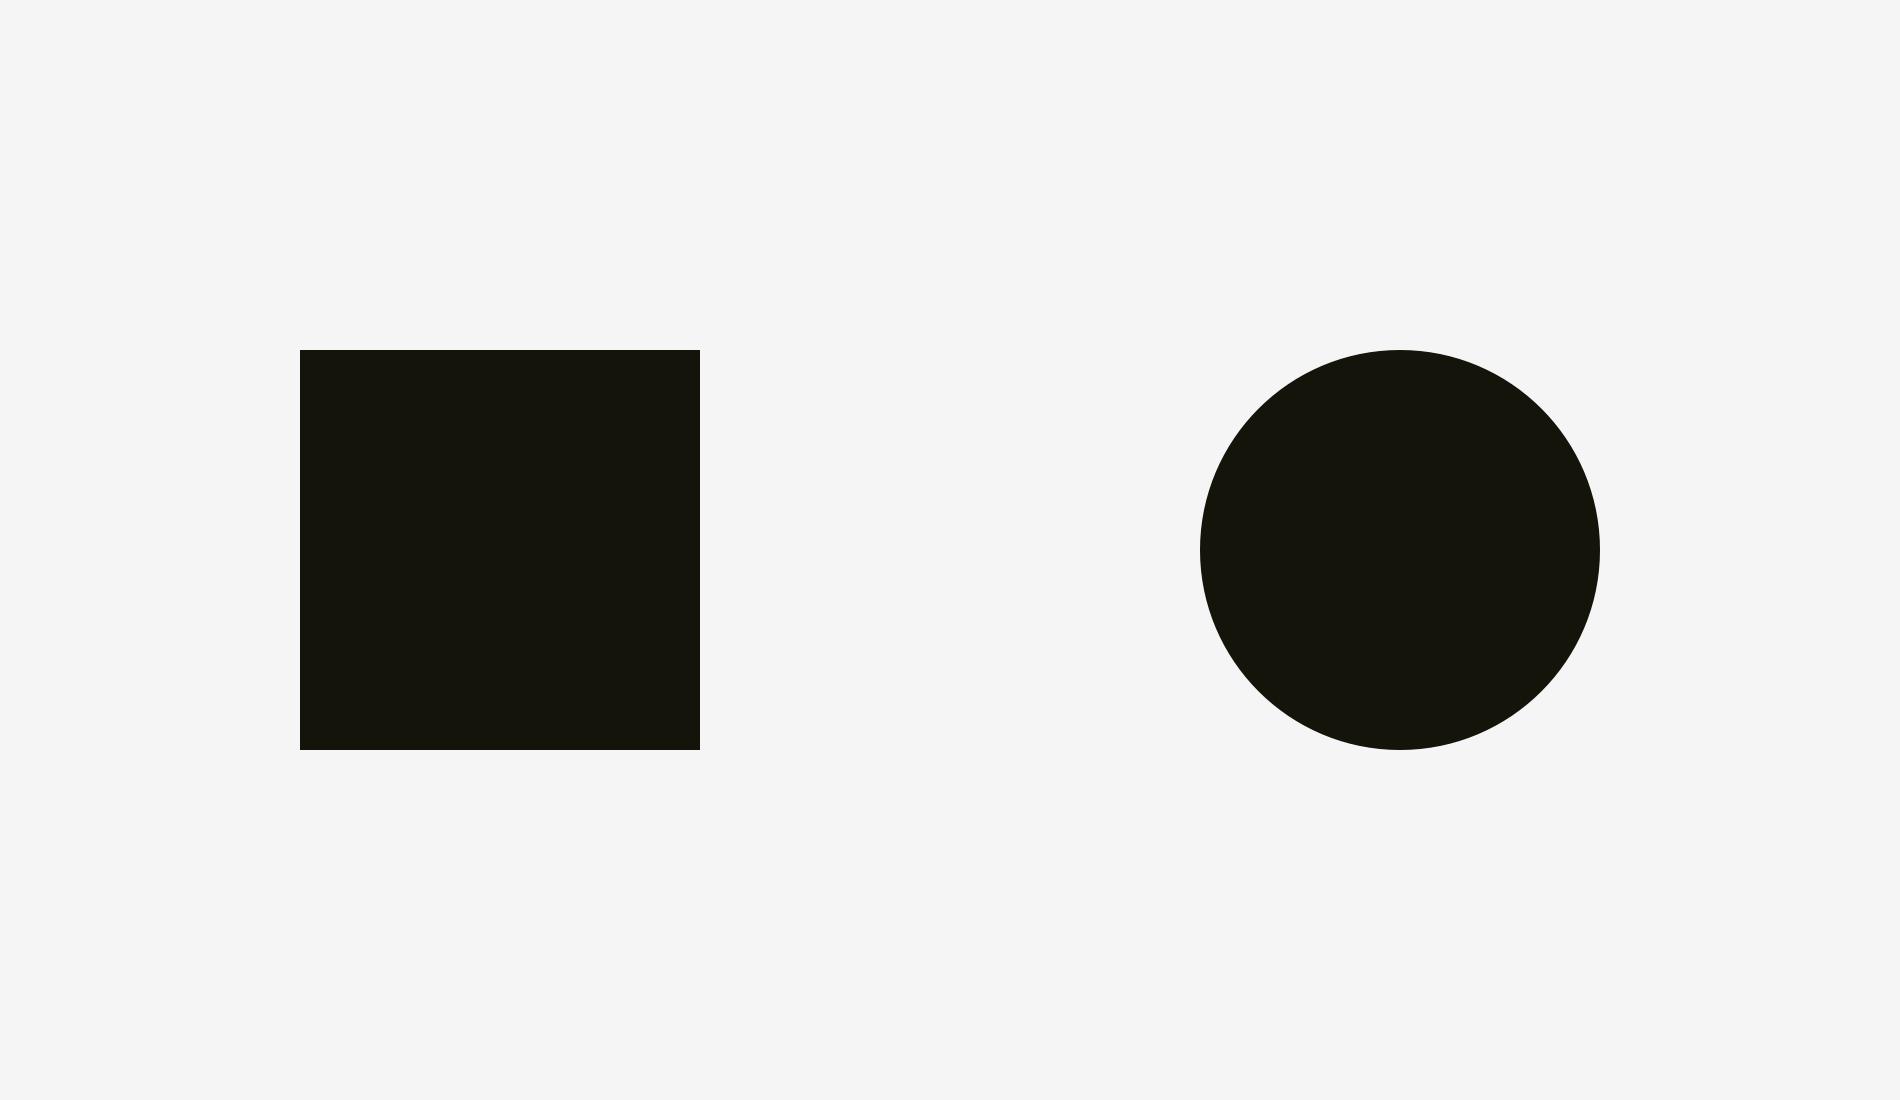 круг или квадрат картинка регулярно куда-то